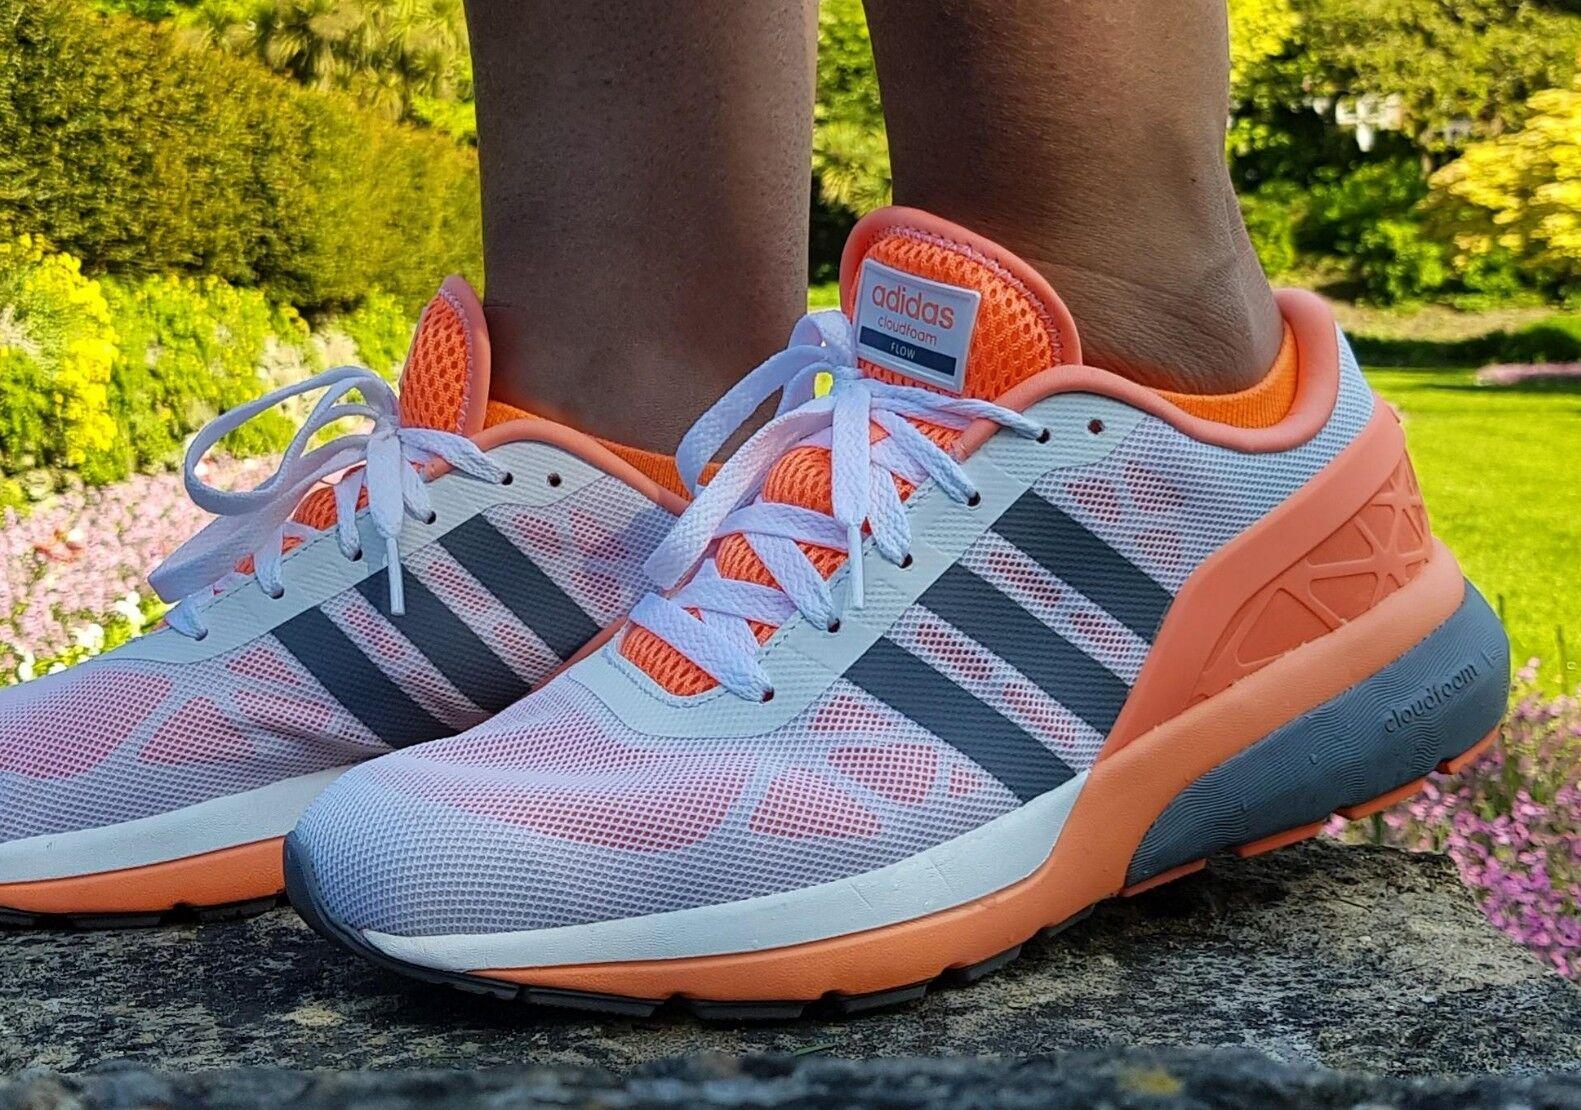 Adidas Damenschuhe Girls Cloudfoam Flow Trainers Running Schuhes F99560 UK 7-9.5